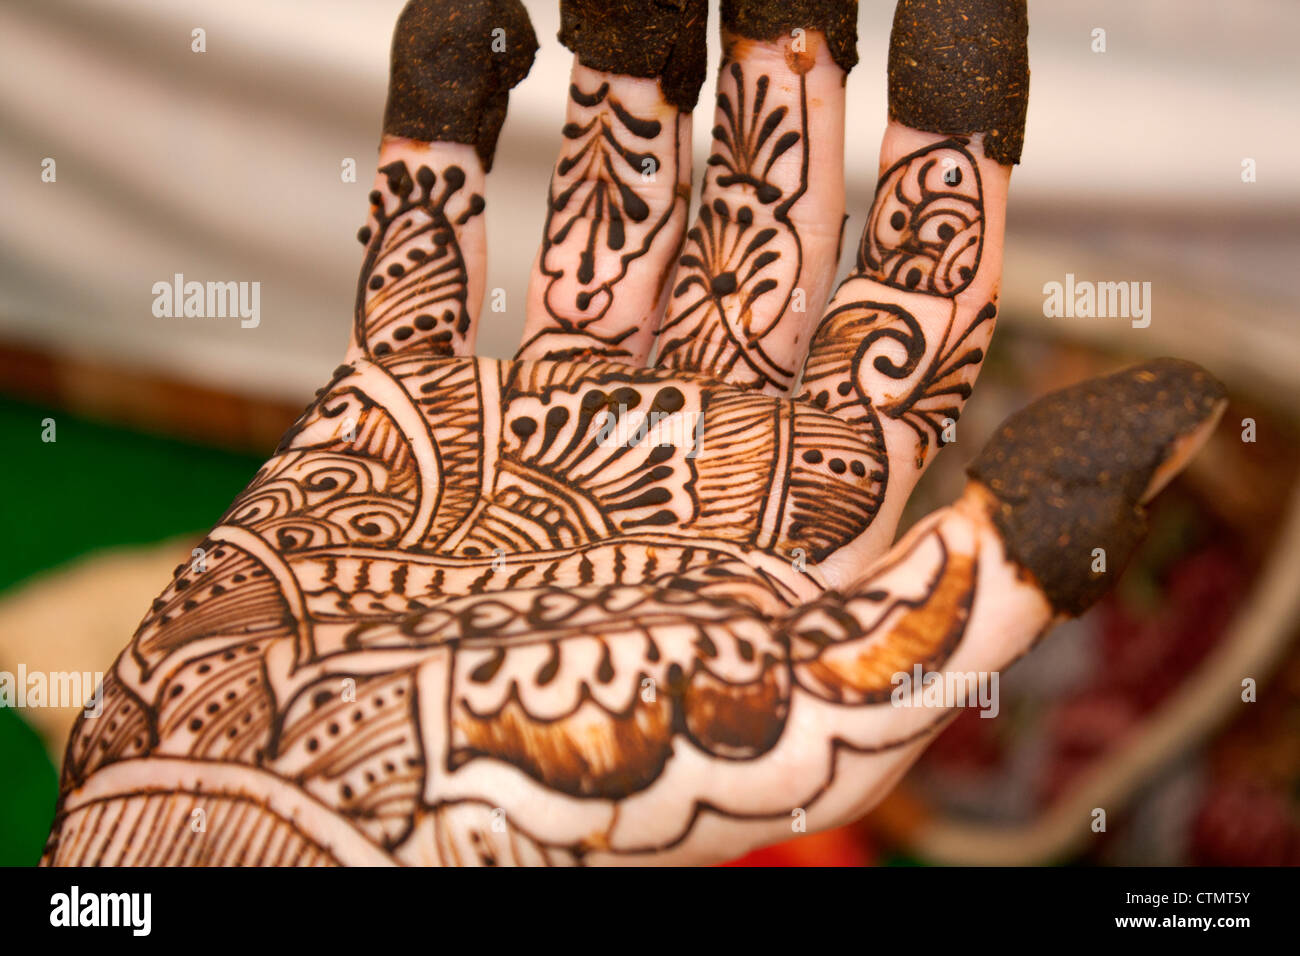 Group Mehndi Hands : Mehendi stock photos & images alamy